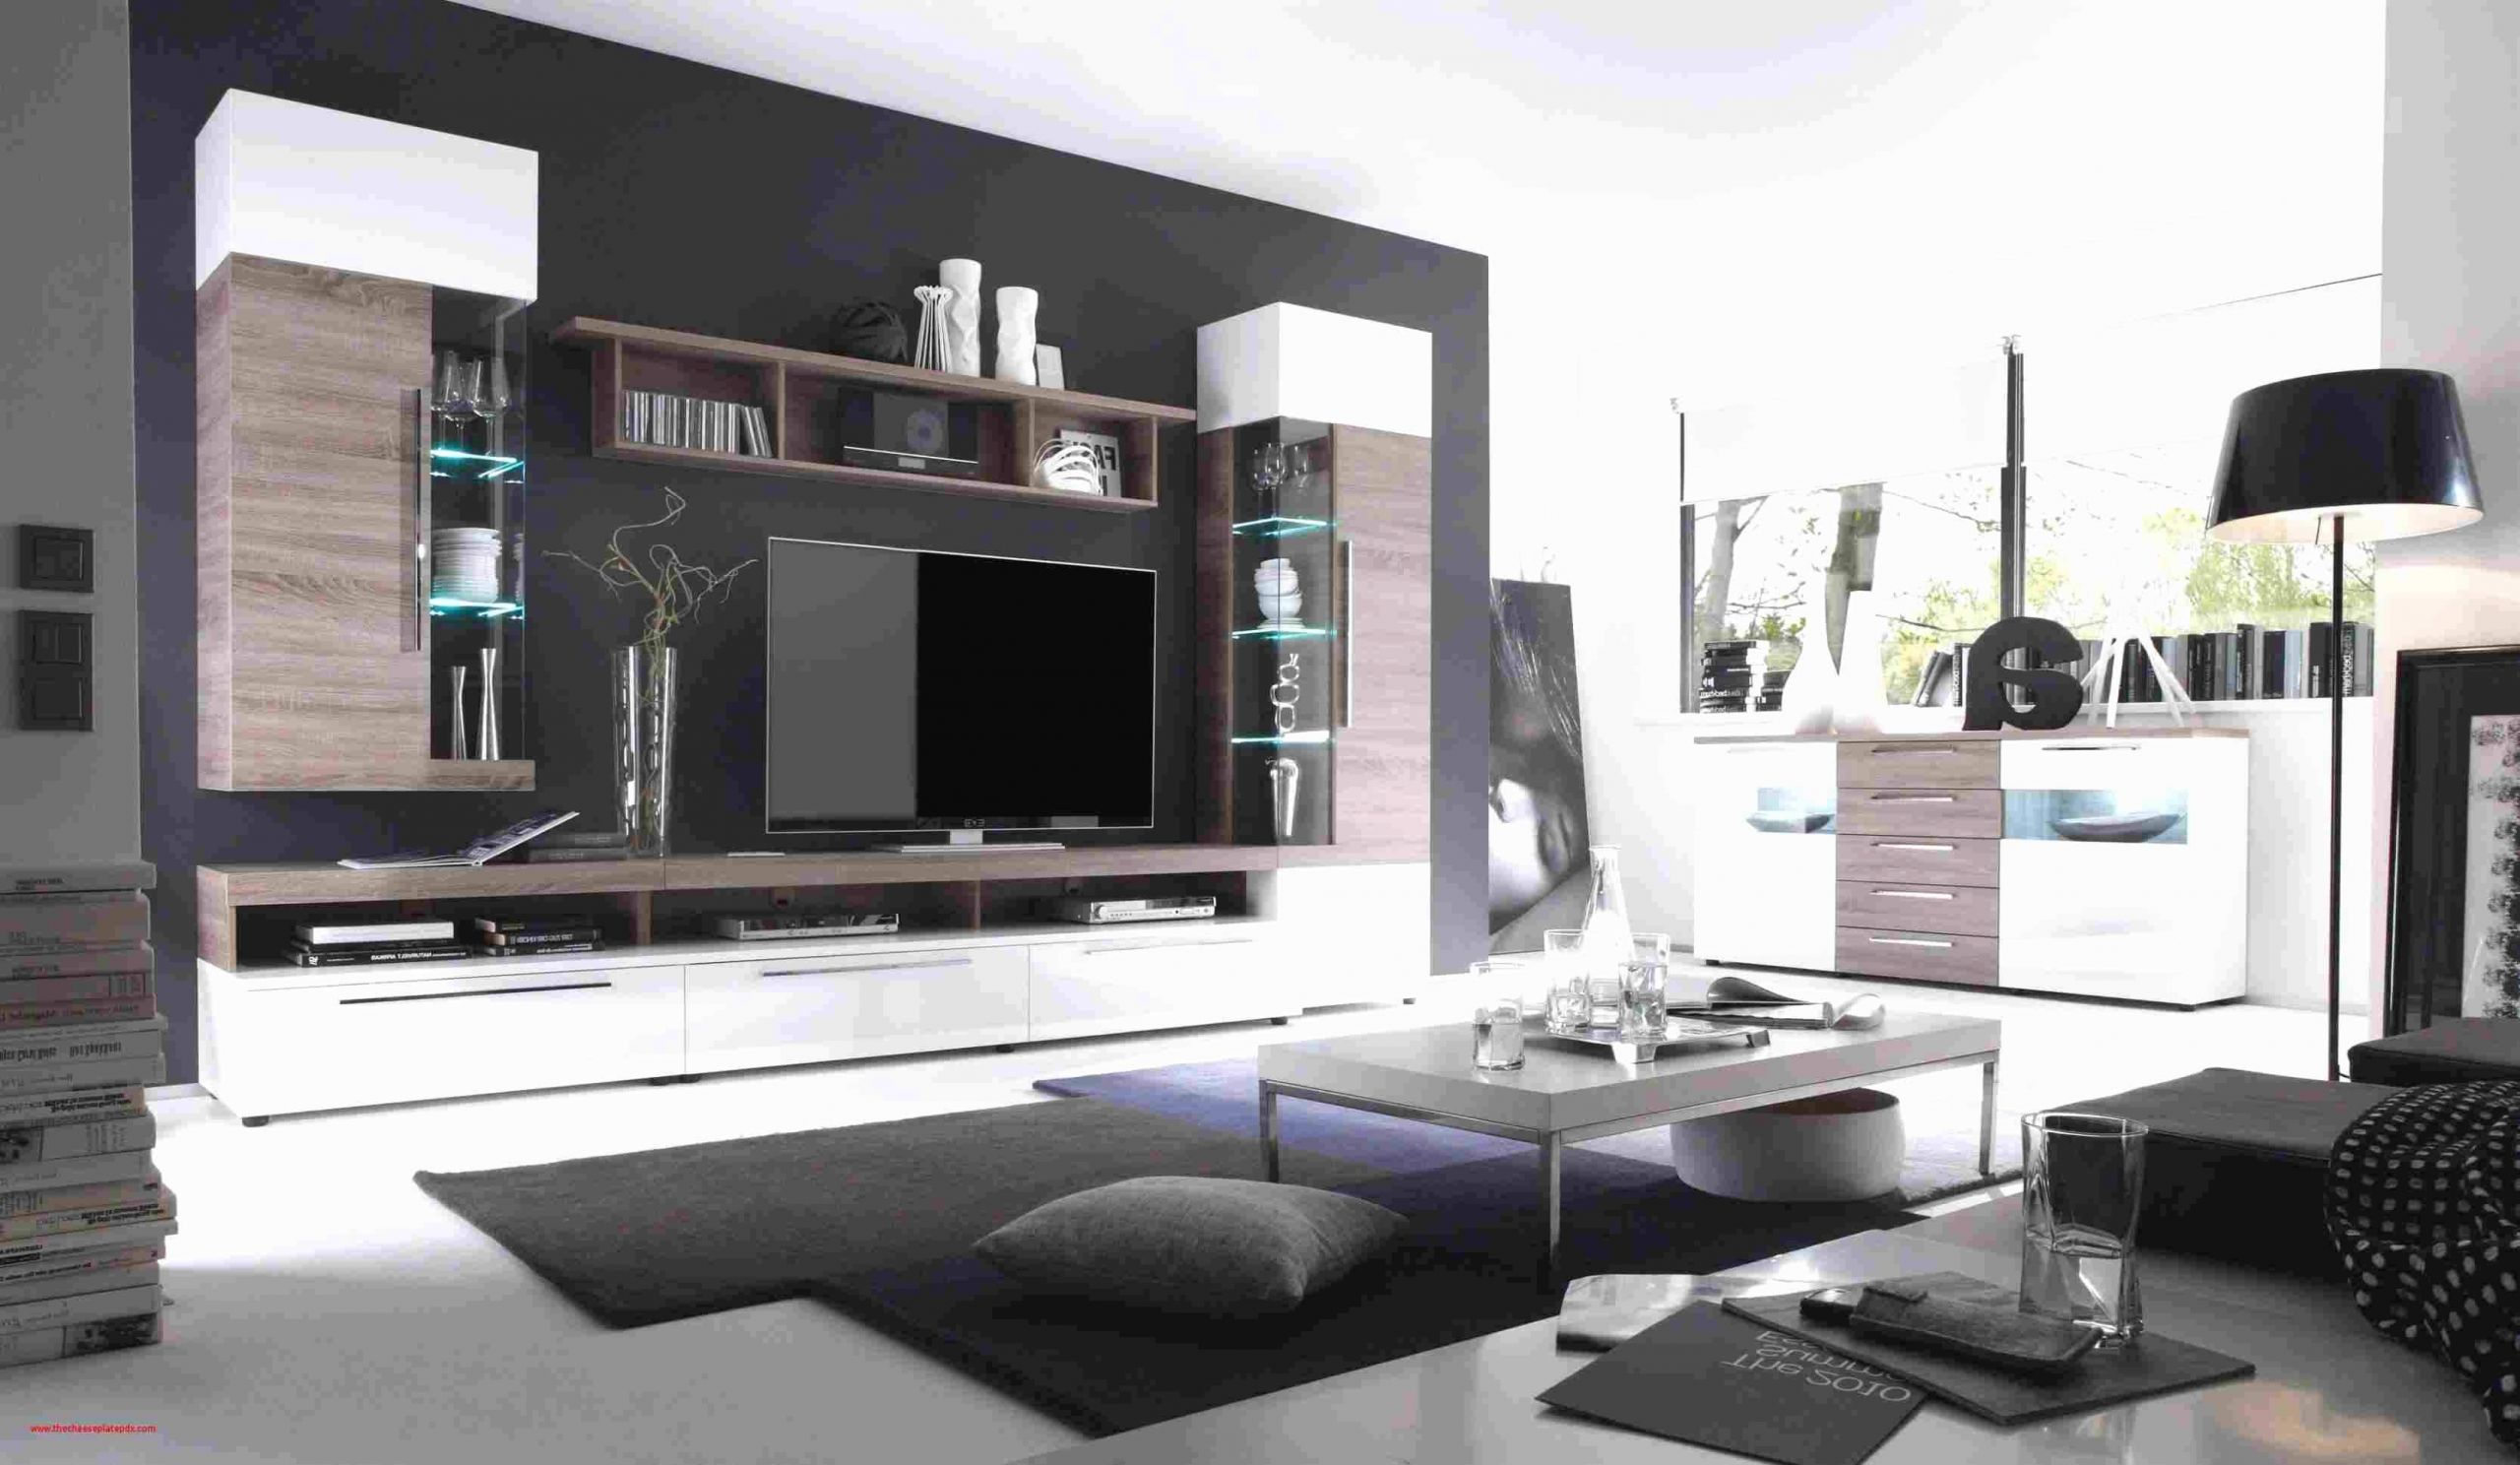 wanddeko wohnzimmer ideen elegant wanddeko wohnzimmer metall einzigartig wohnzimmer deko wand of wanddeko wohnzimmer ideen scaled